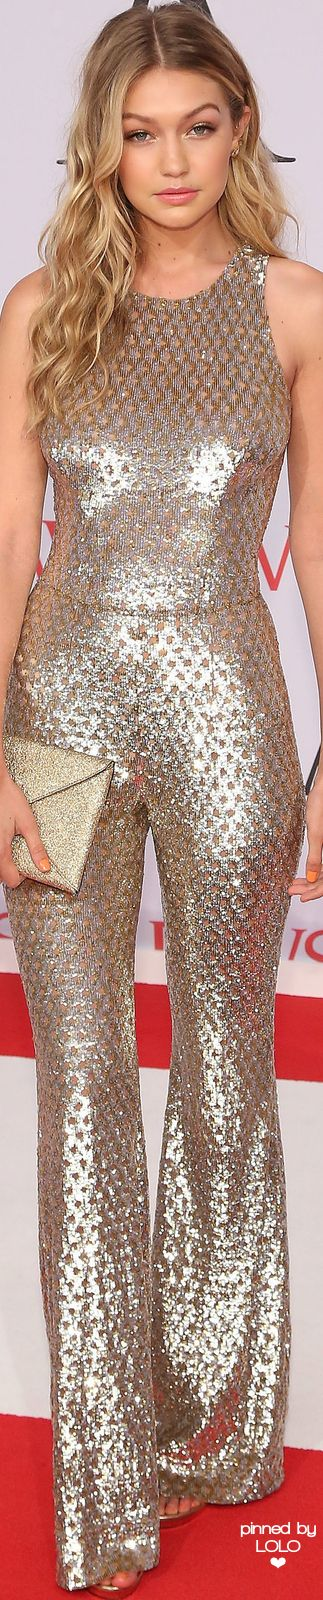 Gigi Hadid 2015 CFDA FASHION AWARDS | LOLO❤